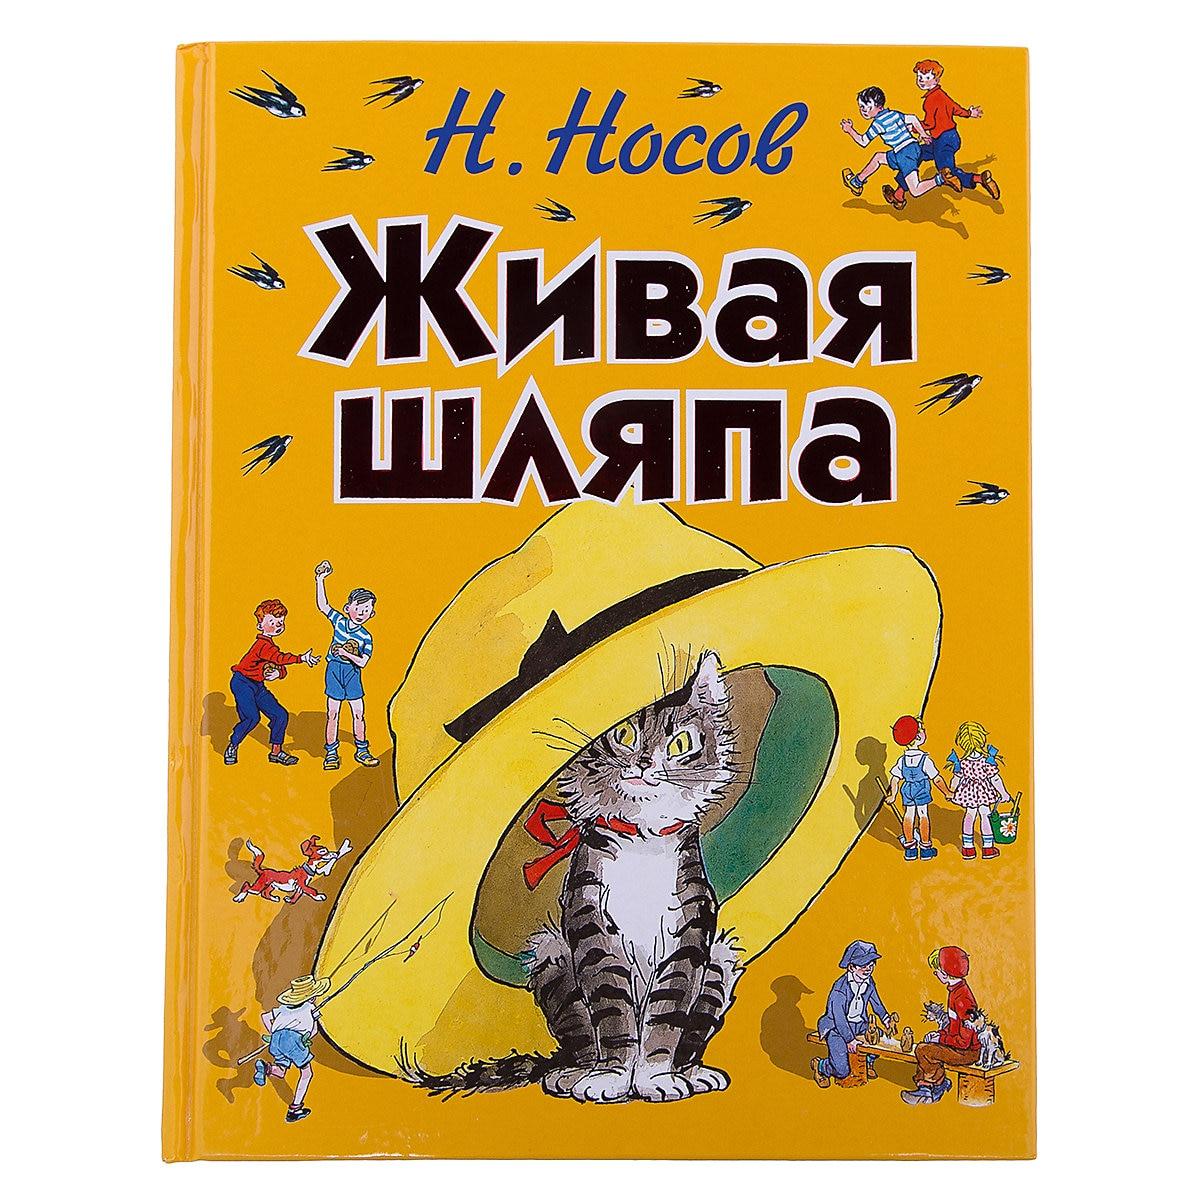 Books EKSMO 4414828 Children Education Encyclopedia Alphabet Dictionary Book For Baby MTpromo